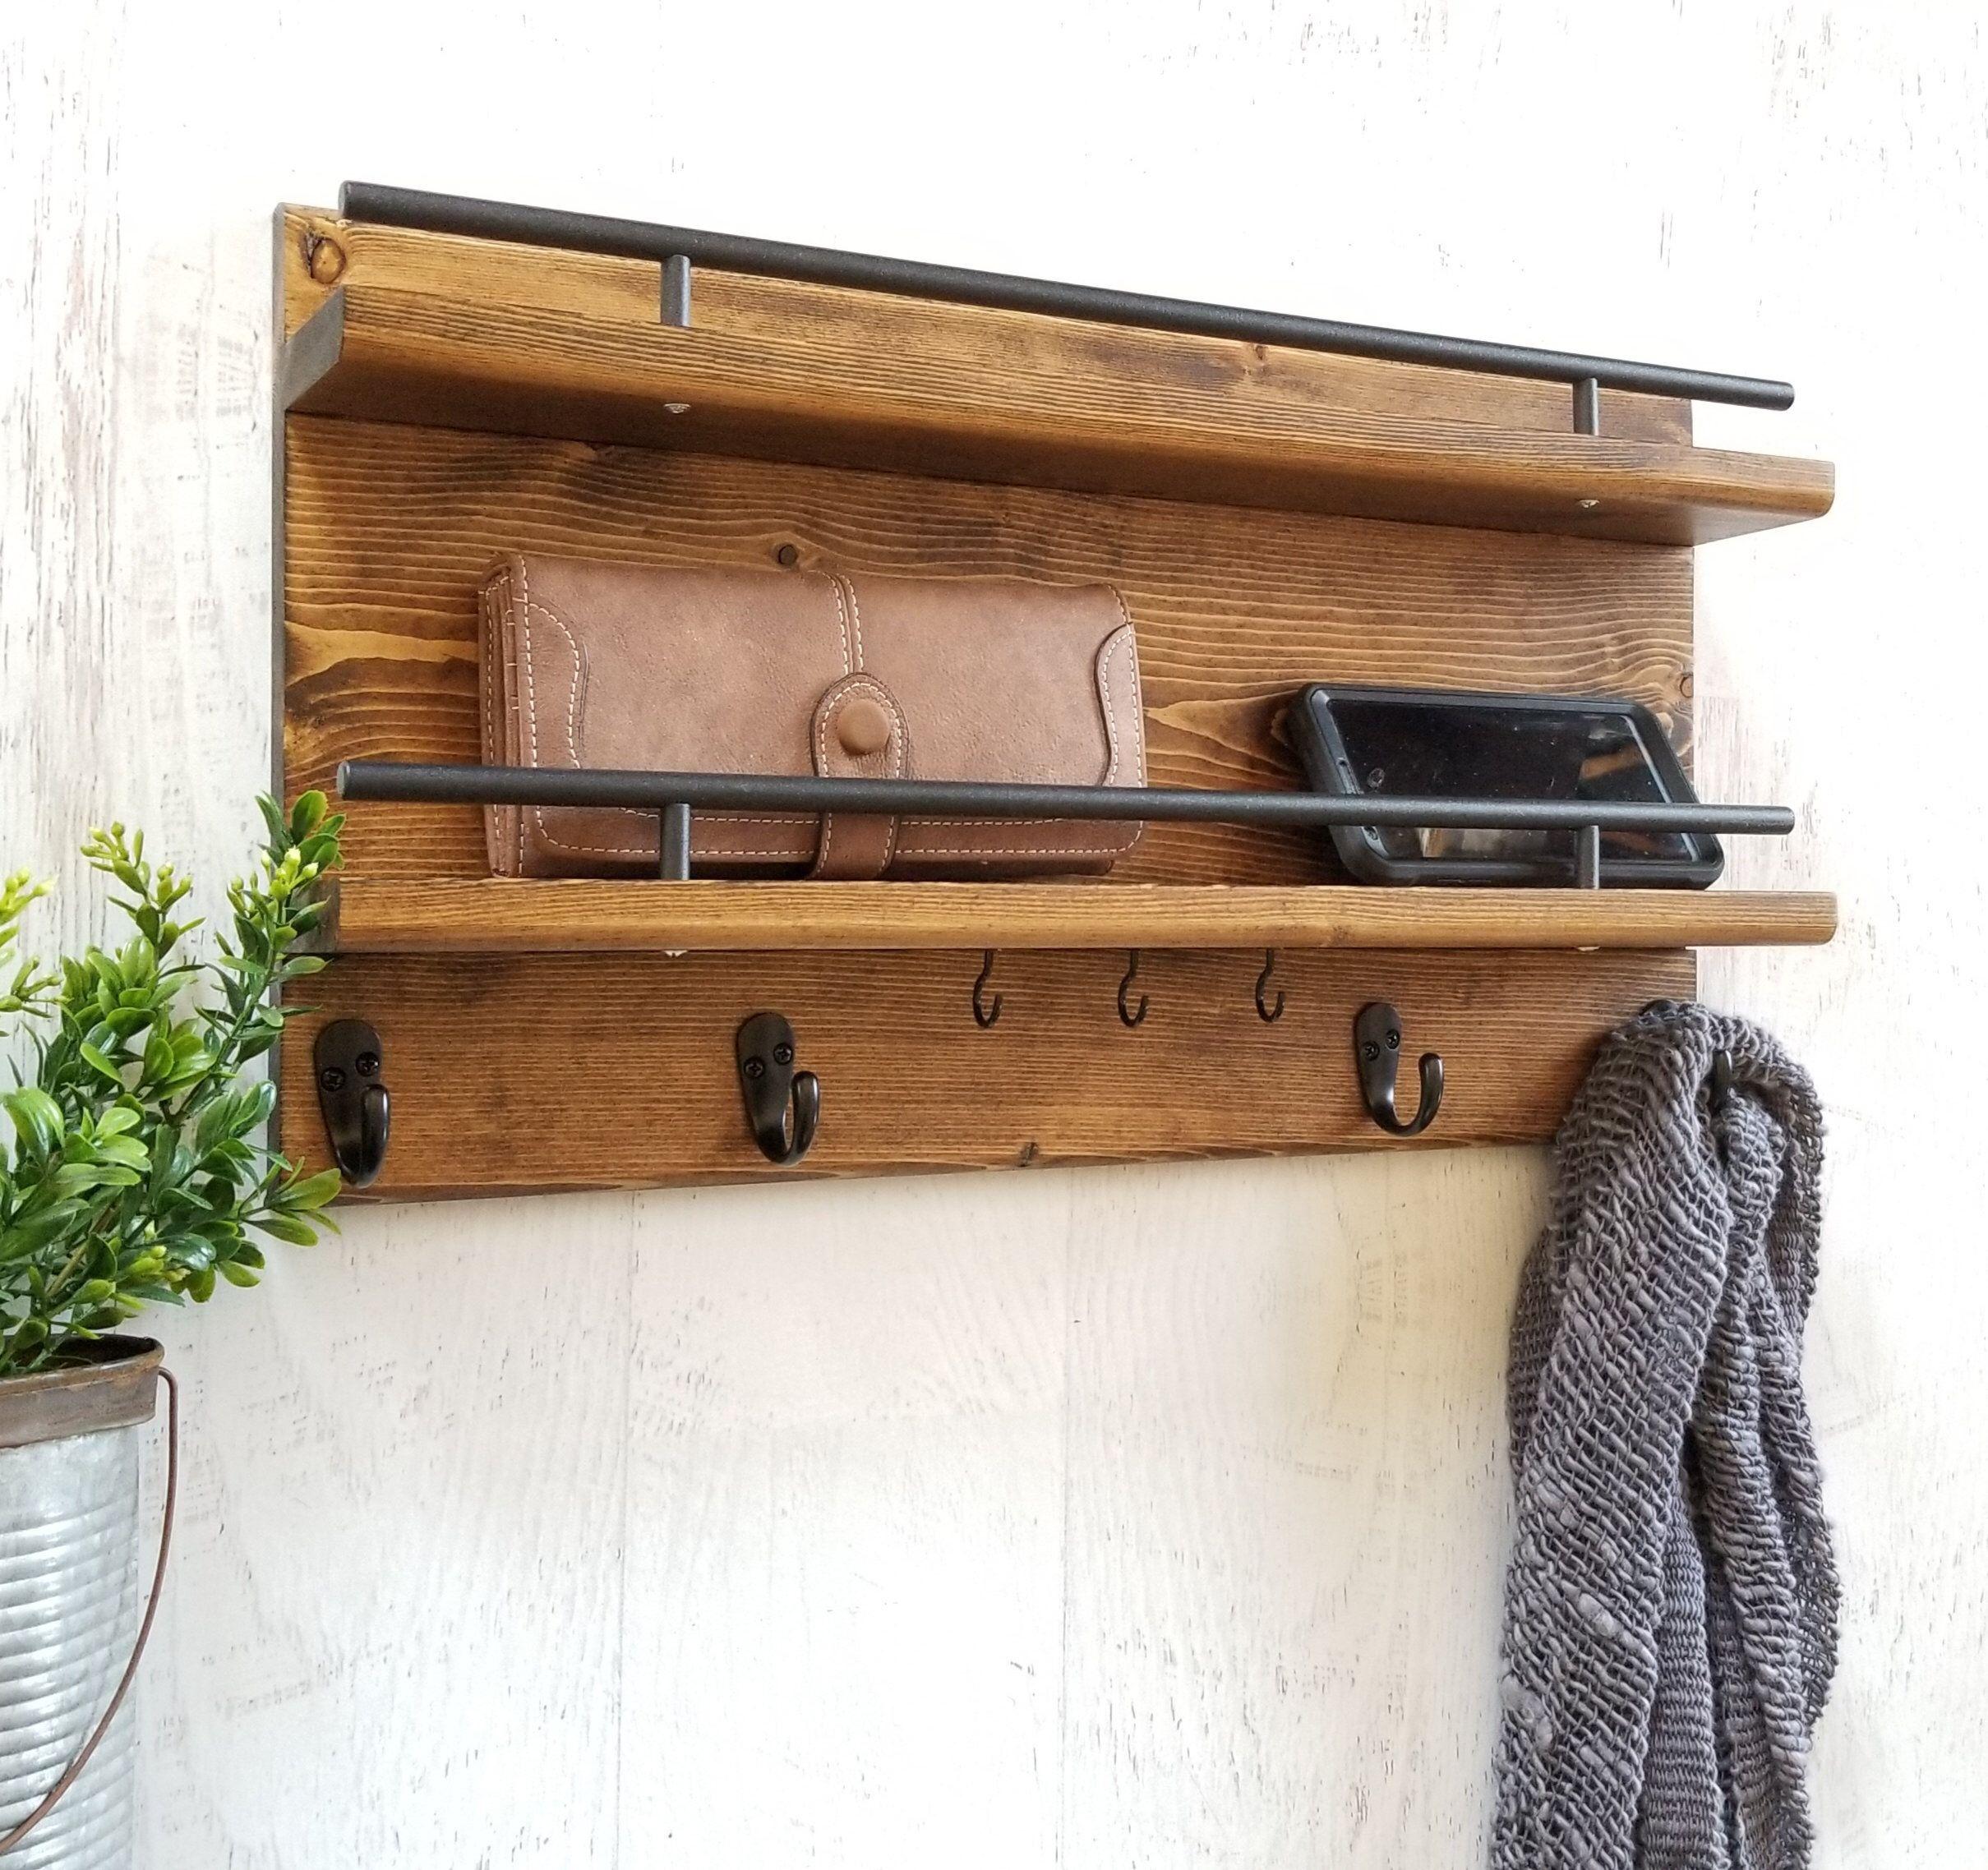 wall coat rack, entry organizer, wall organizer, coat rack, wall hook, mail organizer, wall decor, wall hangings, entryway coat rack,